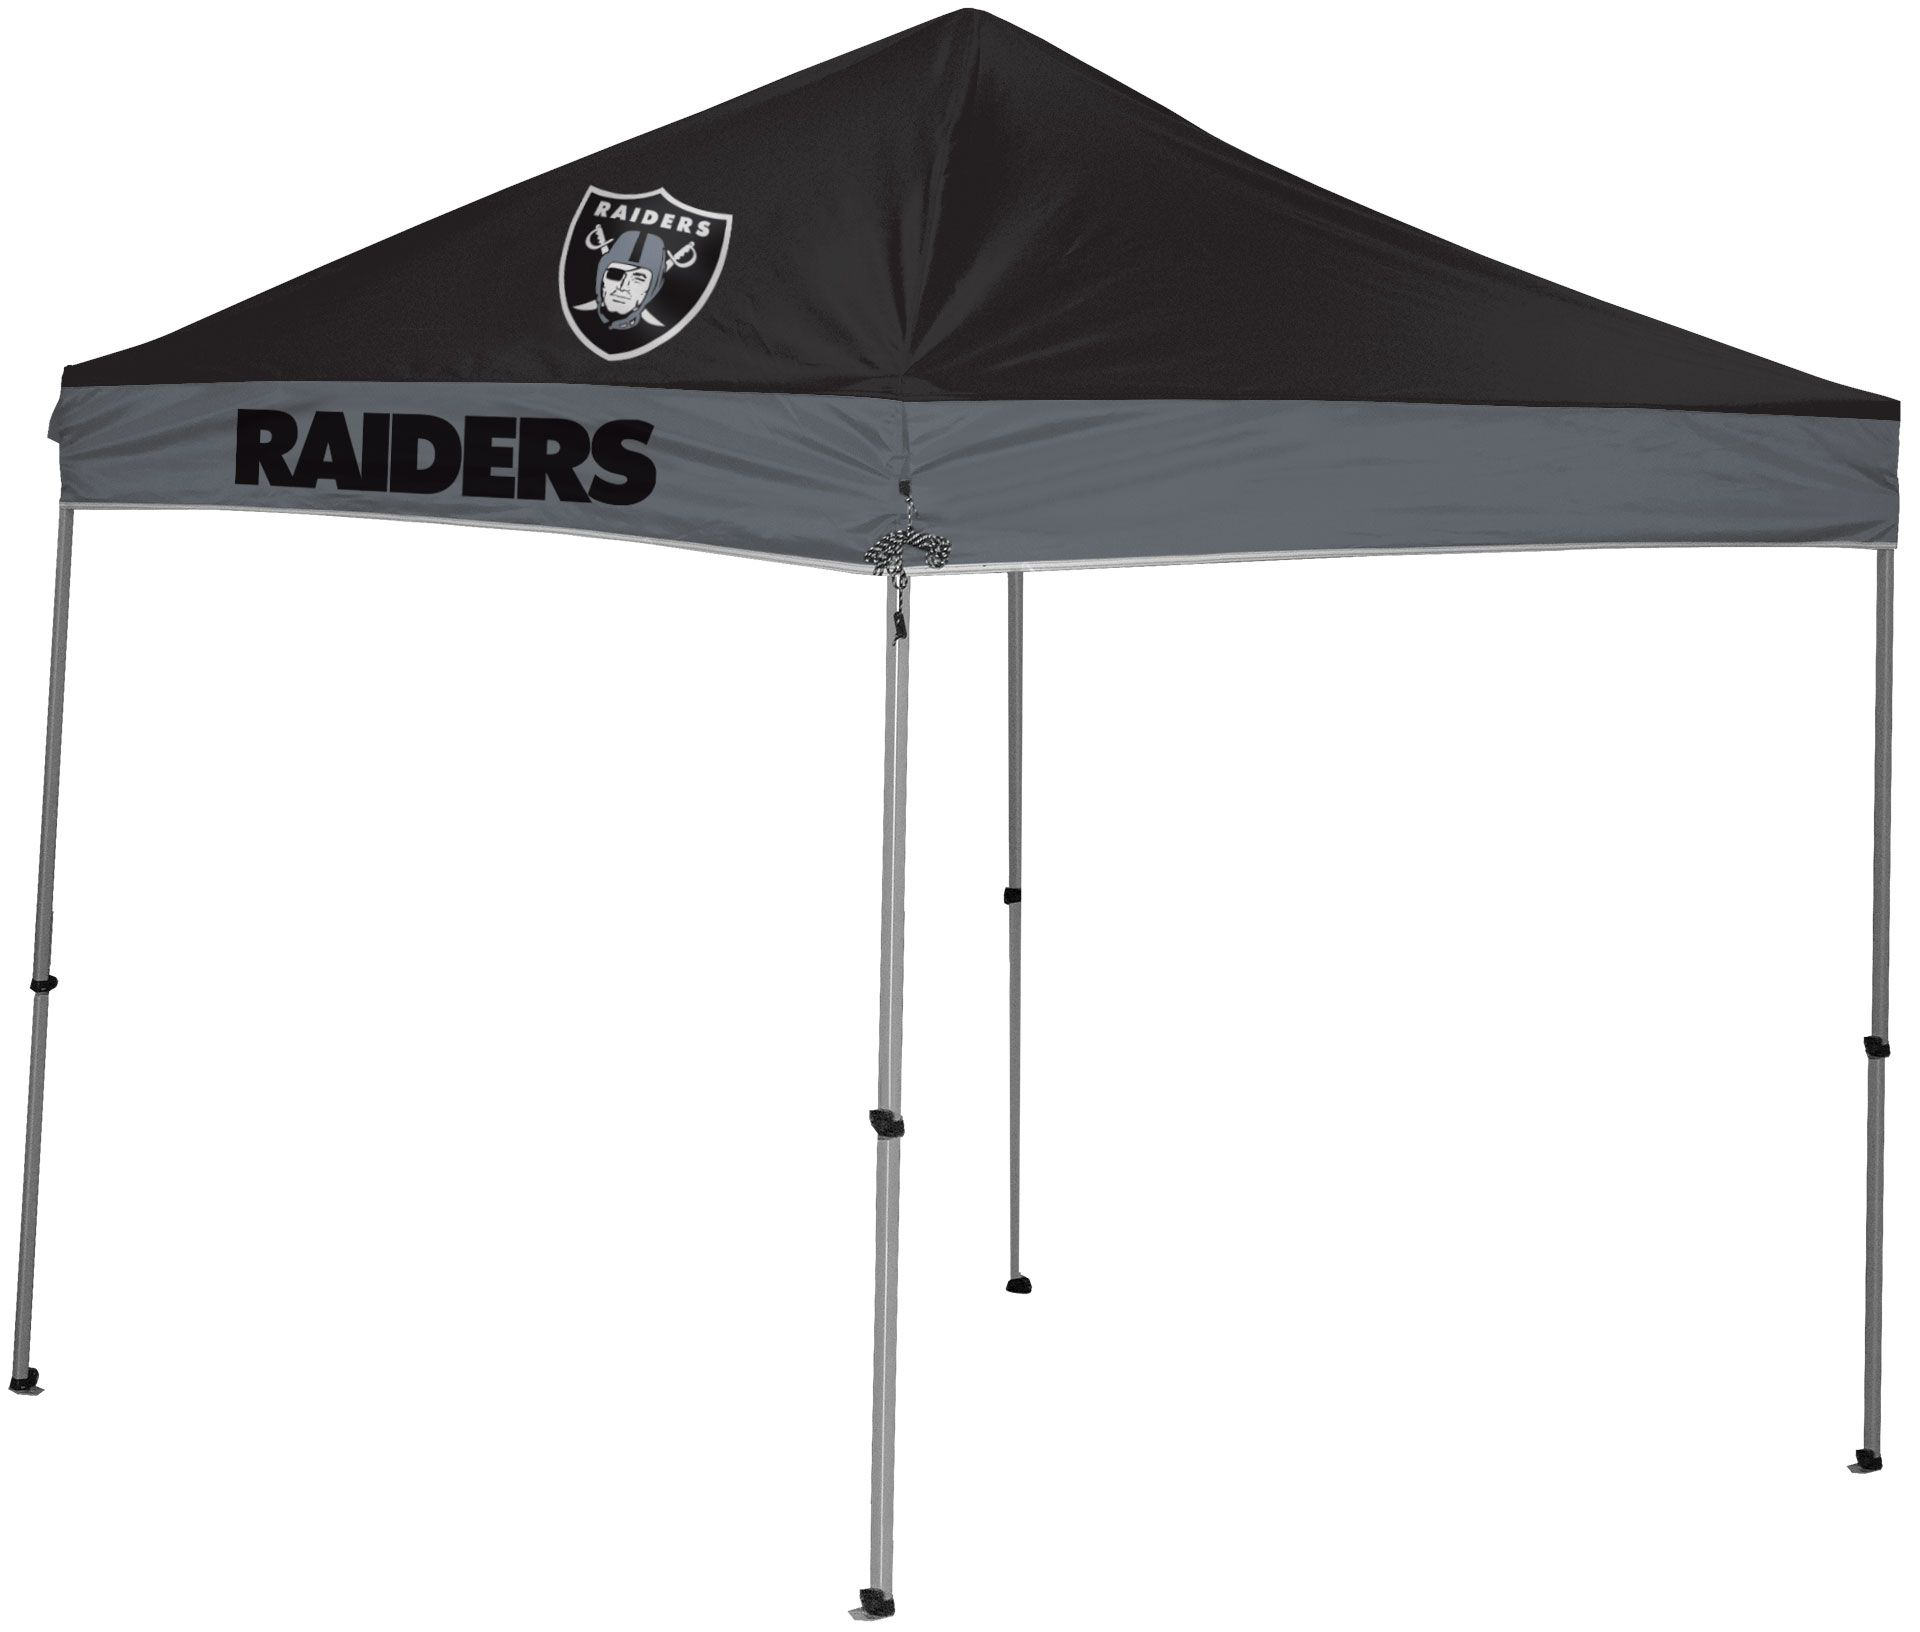 noImageFound ???  sc 1 st  DICKu0027S Sporting Goods & Rawlings Oakland Raiders 9u0027 x 9u0027 Sideline Canopy Tent | DICKu0027S ...